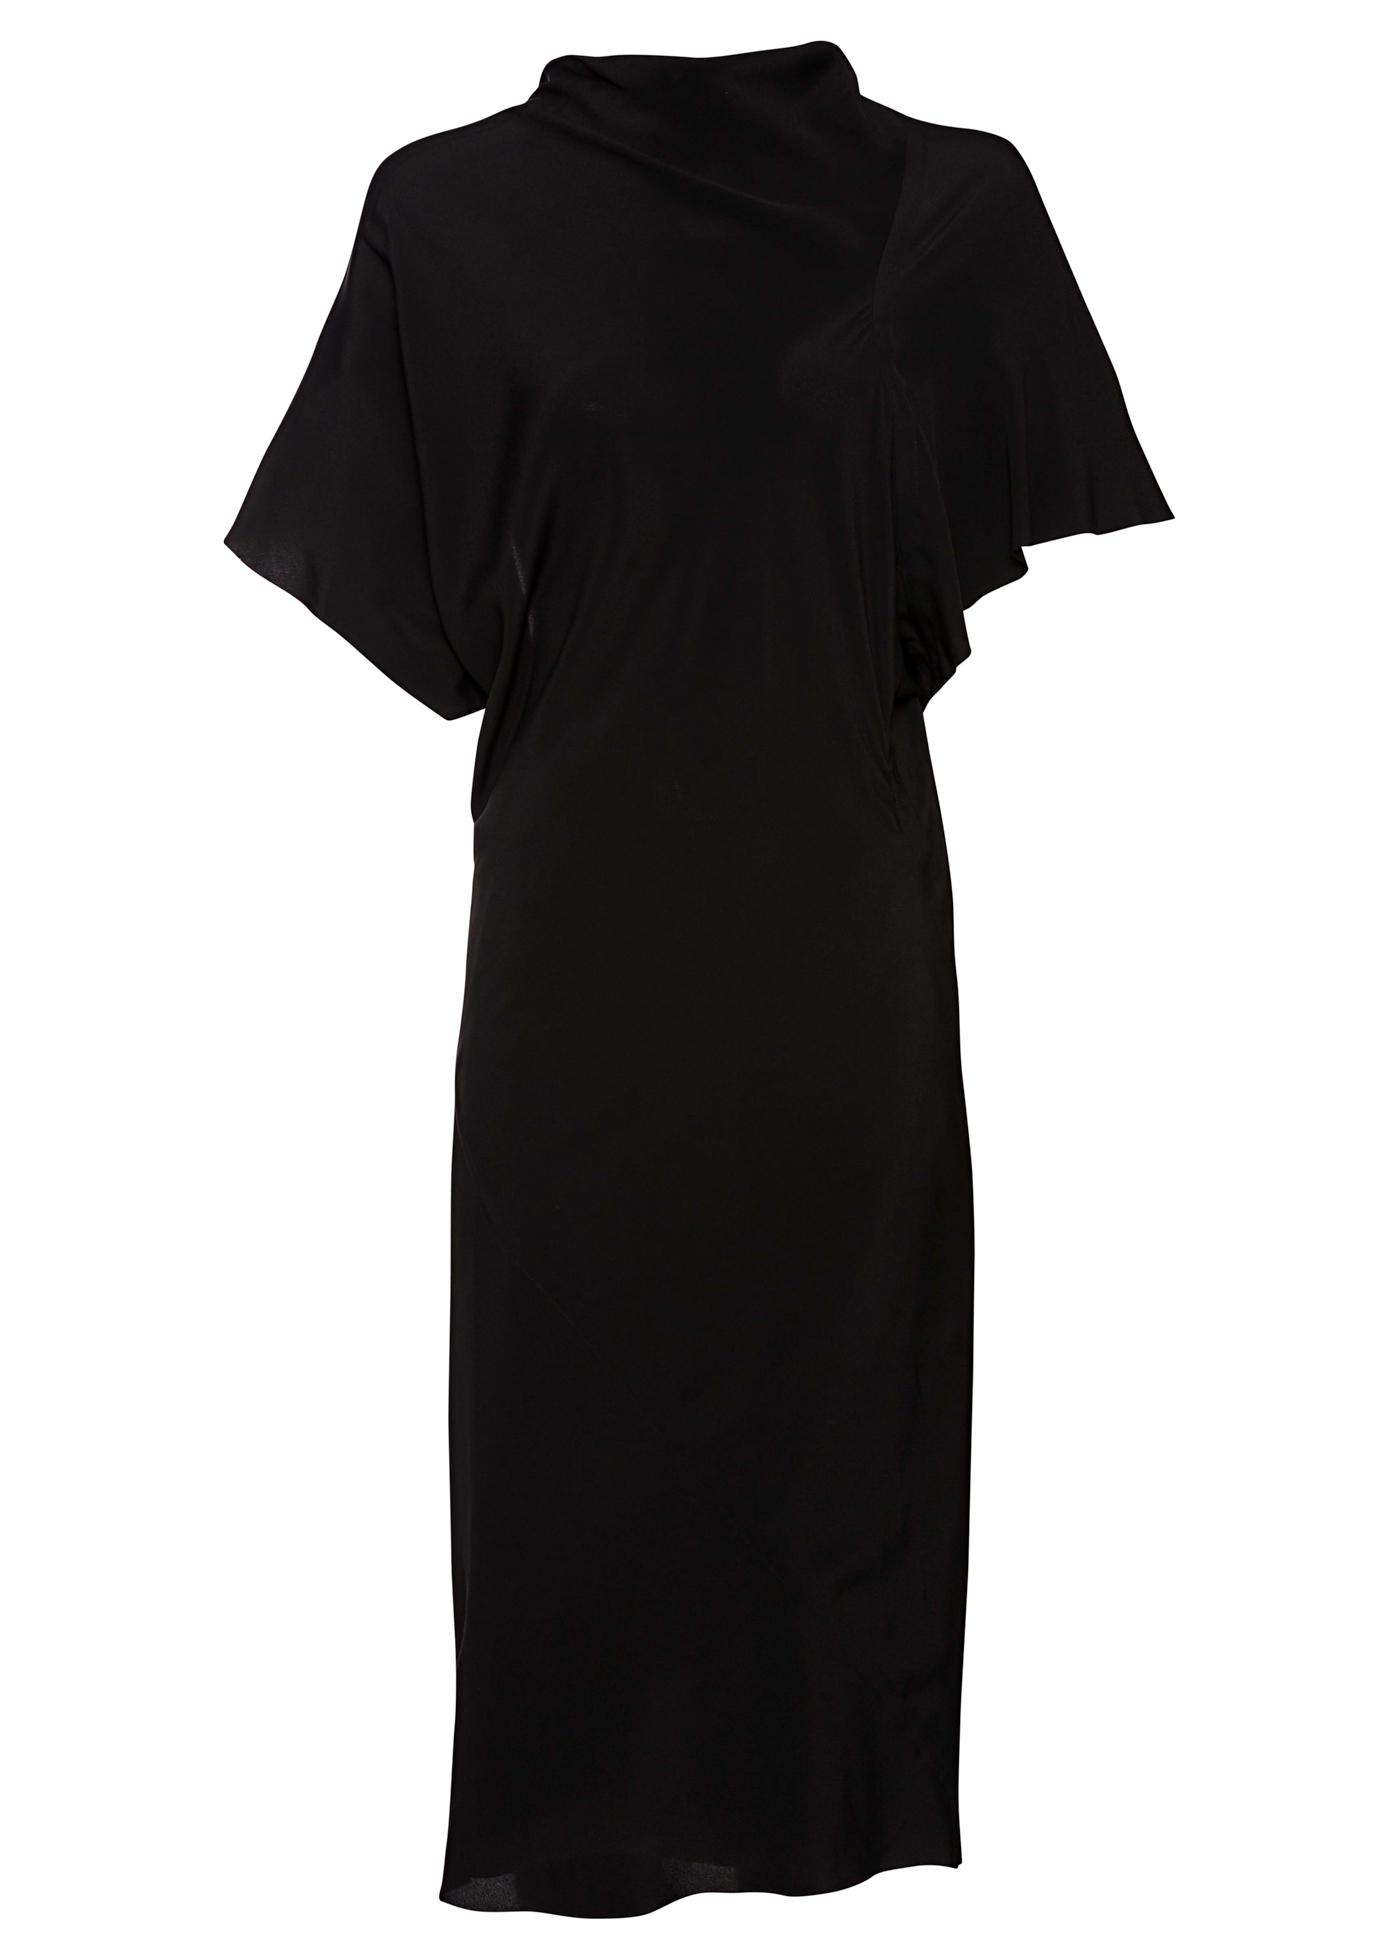 SEB DRESS image number 0